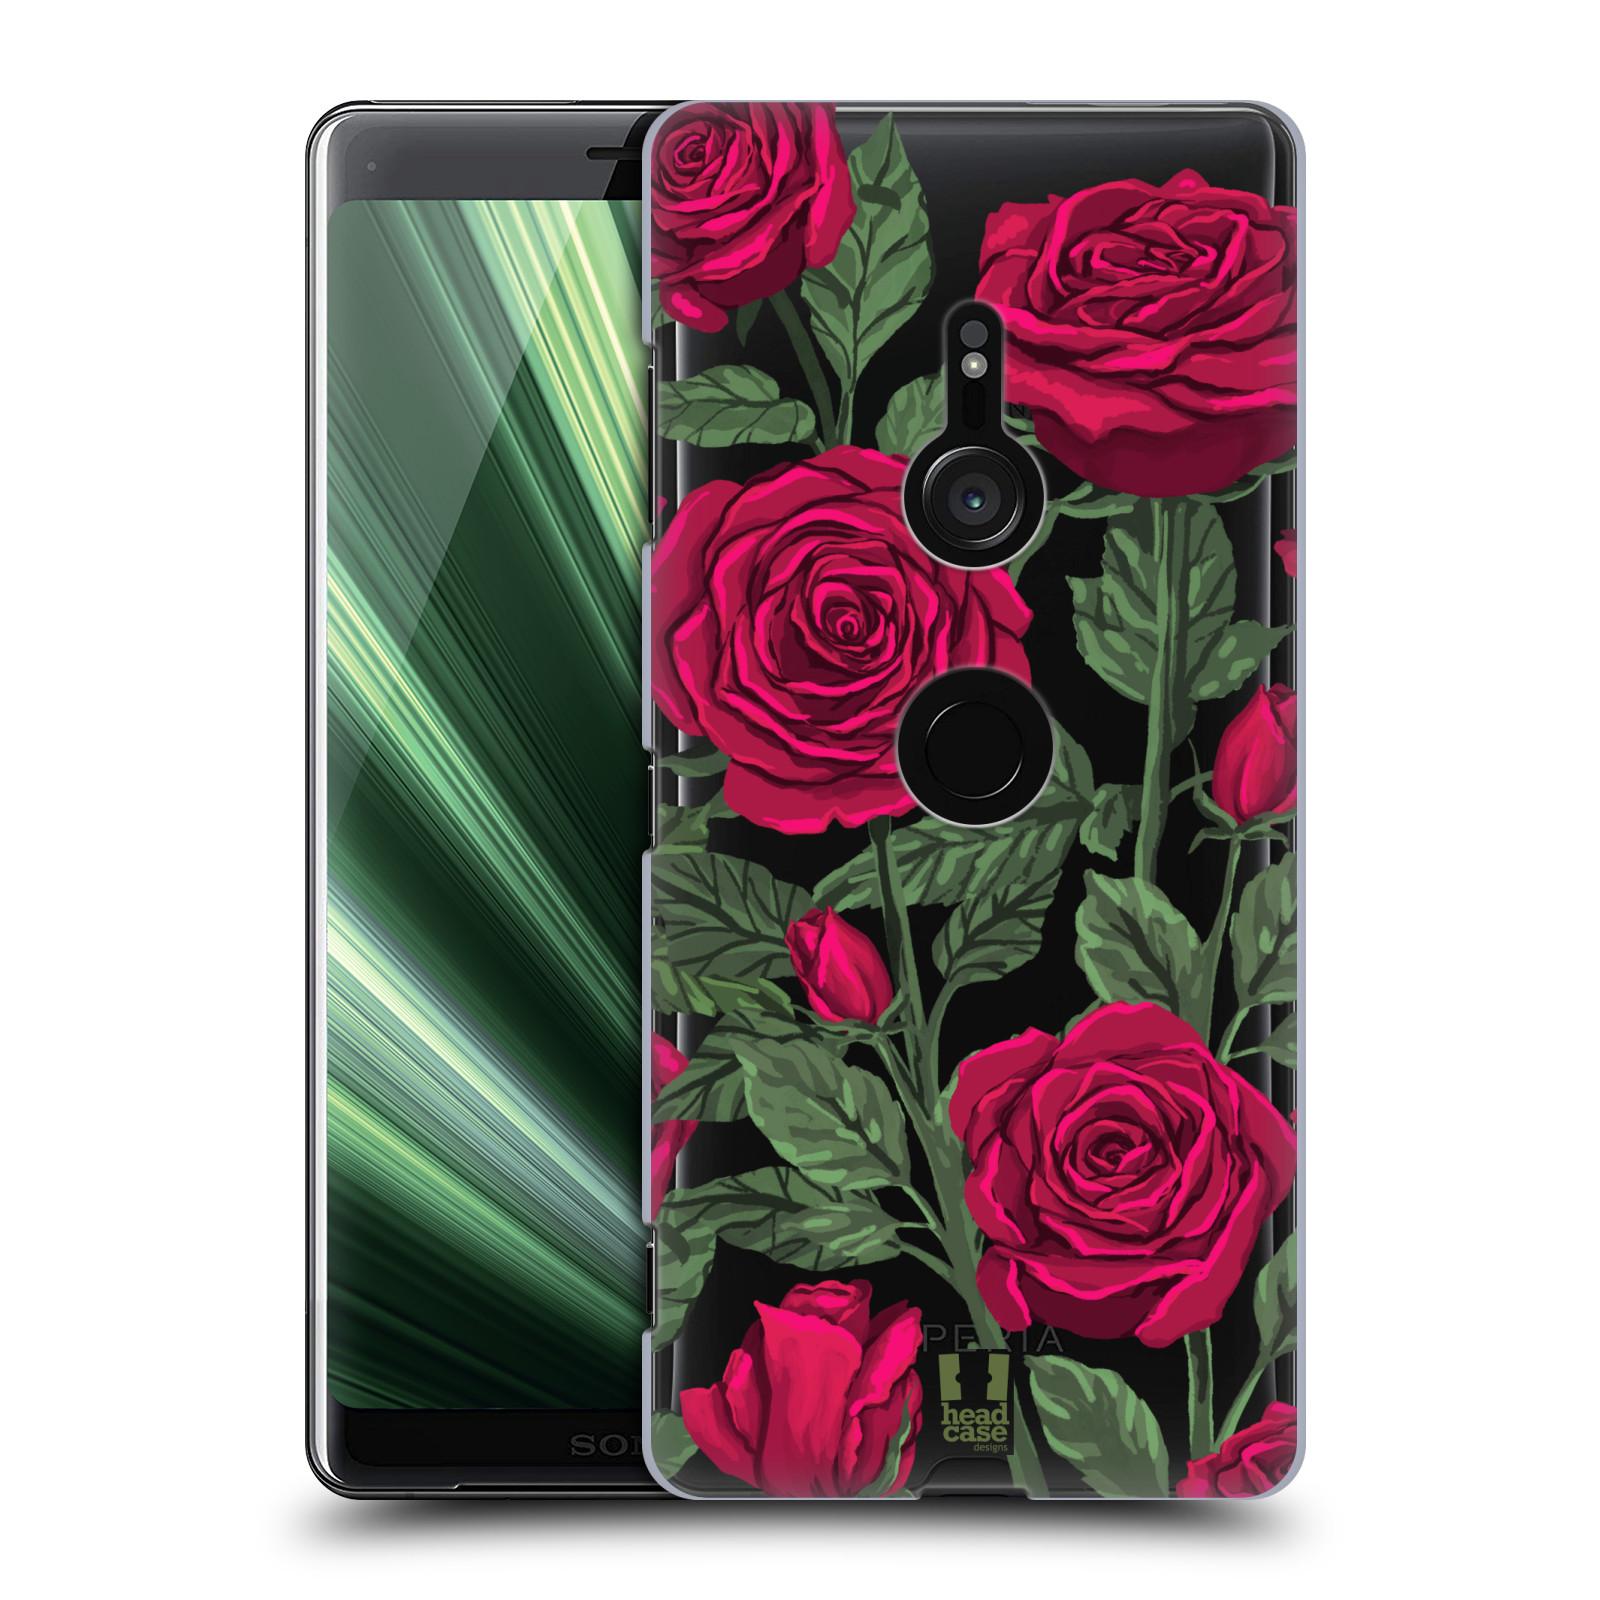 Pouzdro na mobil Sony Xperia XZ3 - HEAD CASE - květina růže